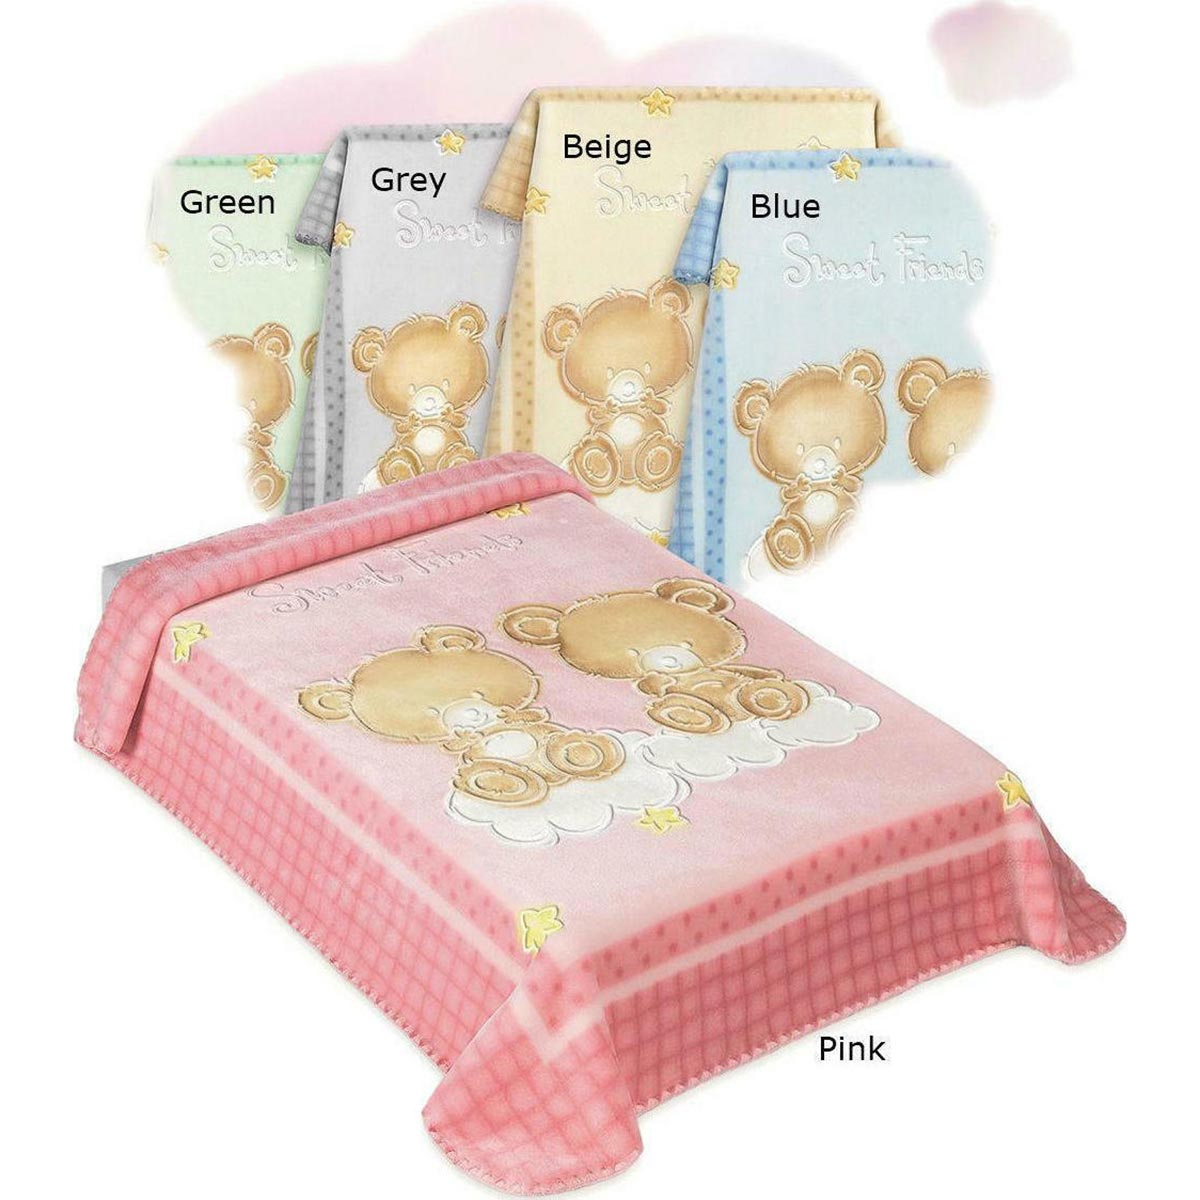 Bunny bebe βρεφική κουβέρτα βελουτέ Belpla Dralon 548